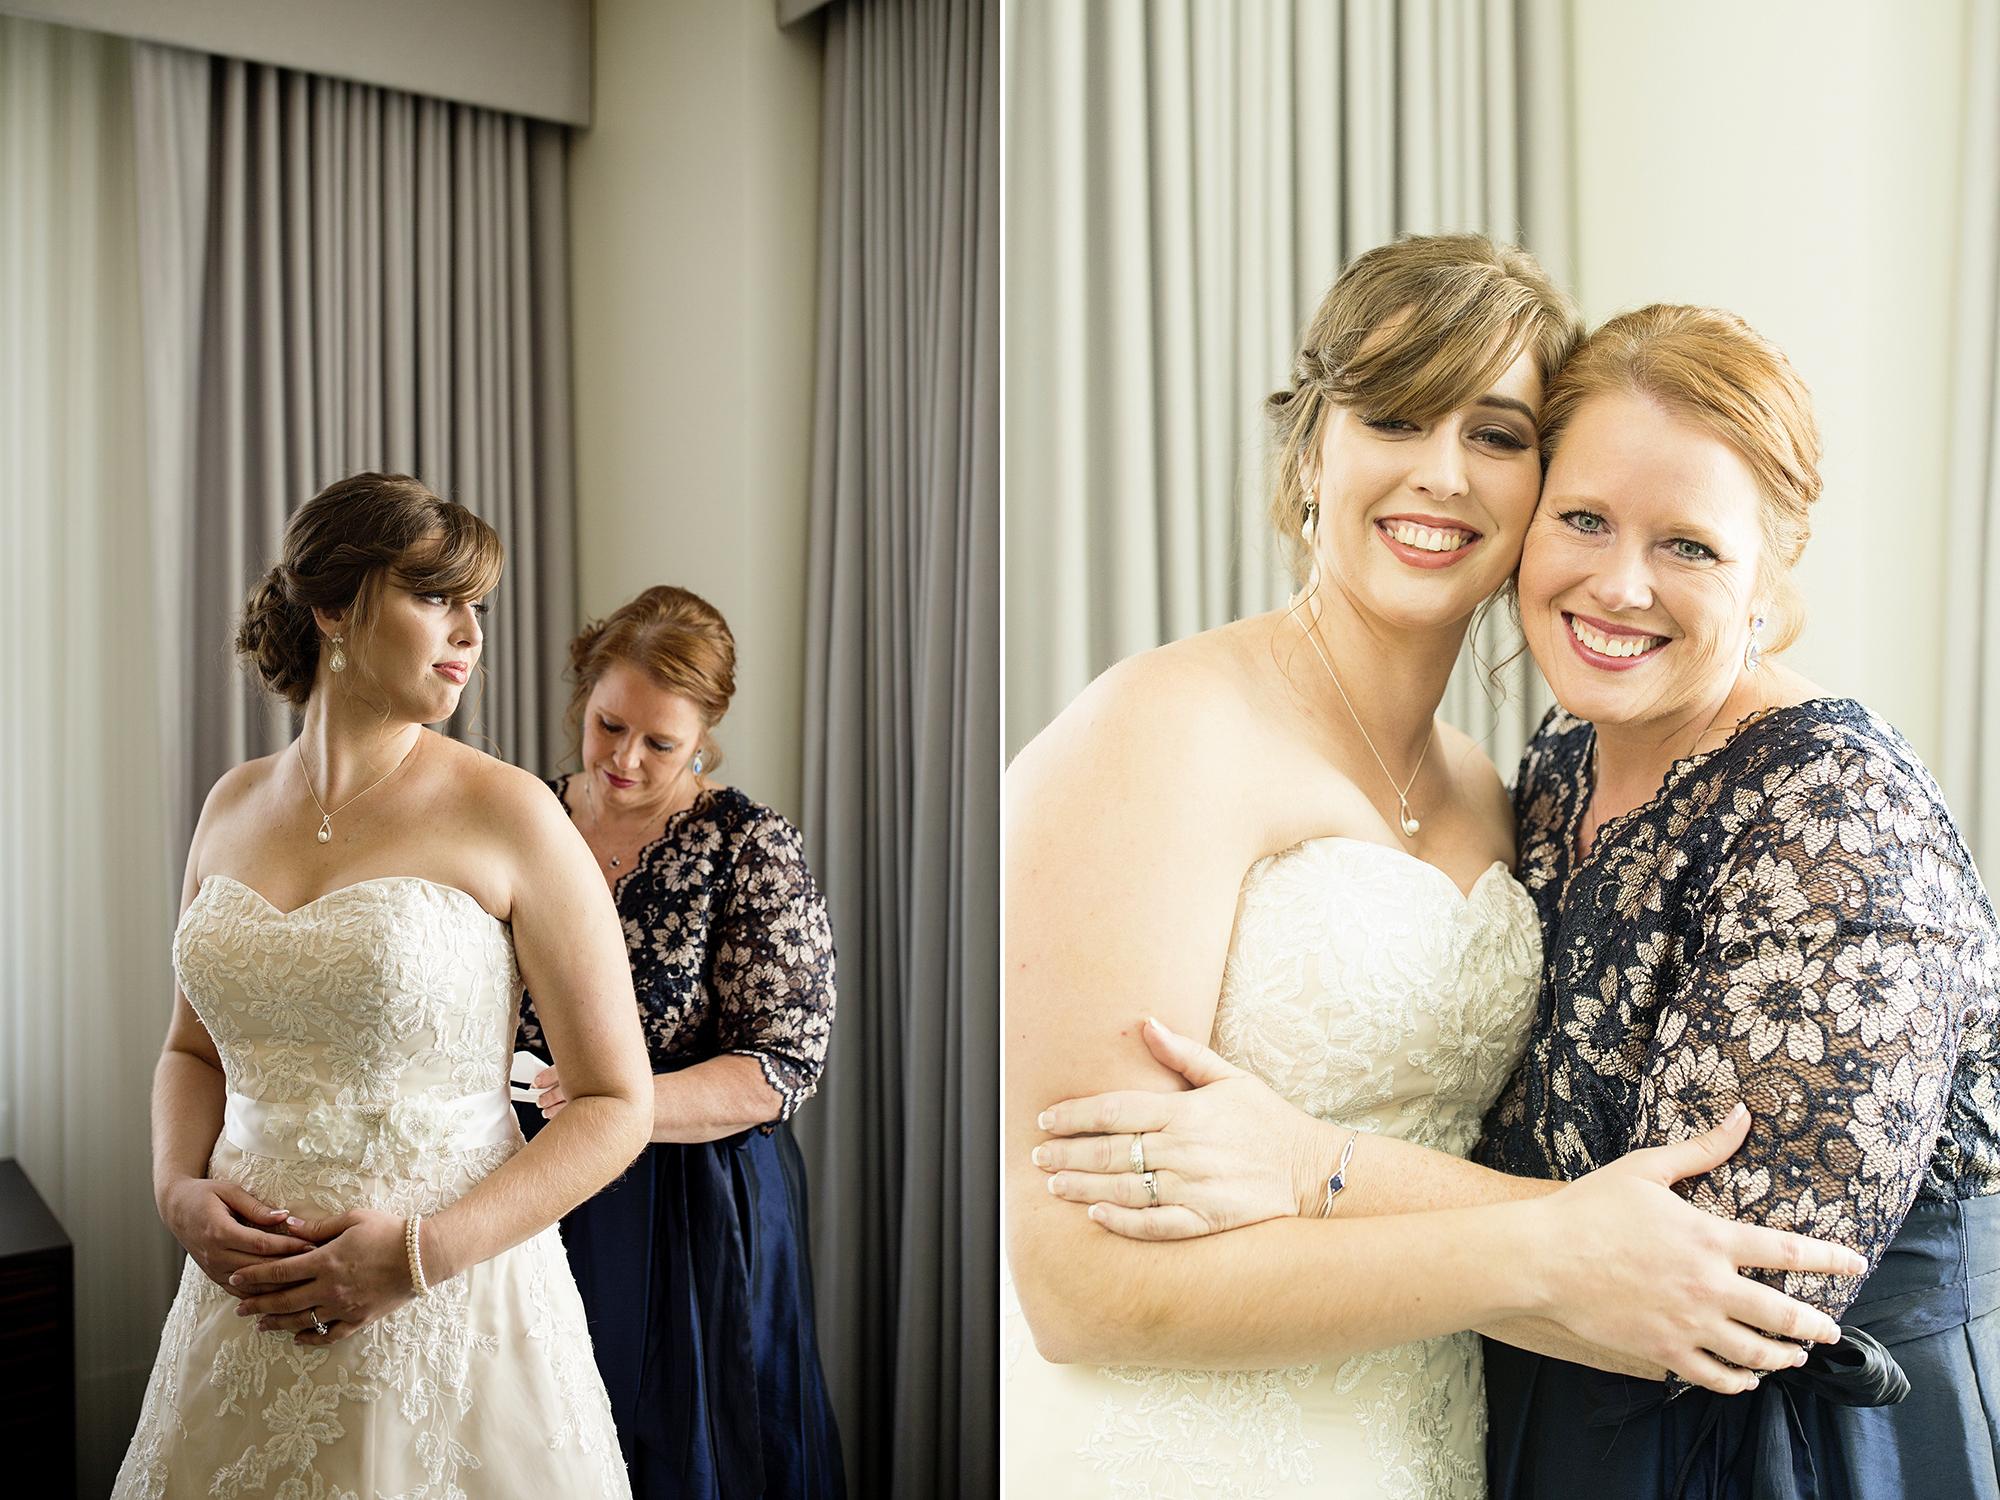 Seriously_Sabrina_Photography_Lexington_Kentucky_21c_Round_Barn_Red_Mile_Wedding_Gorley_26.jpg